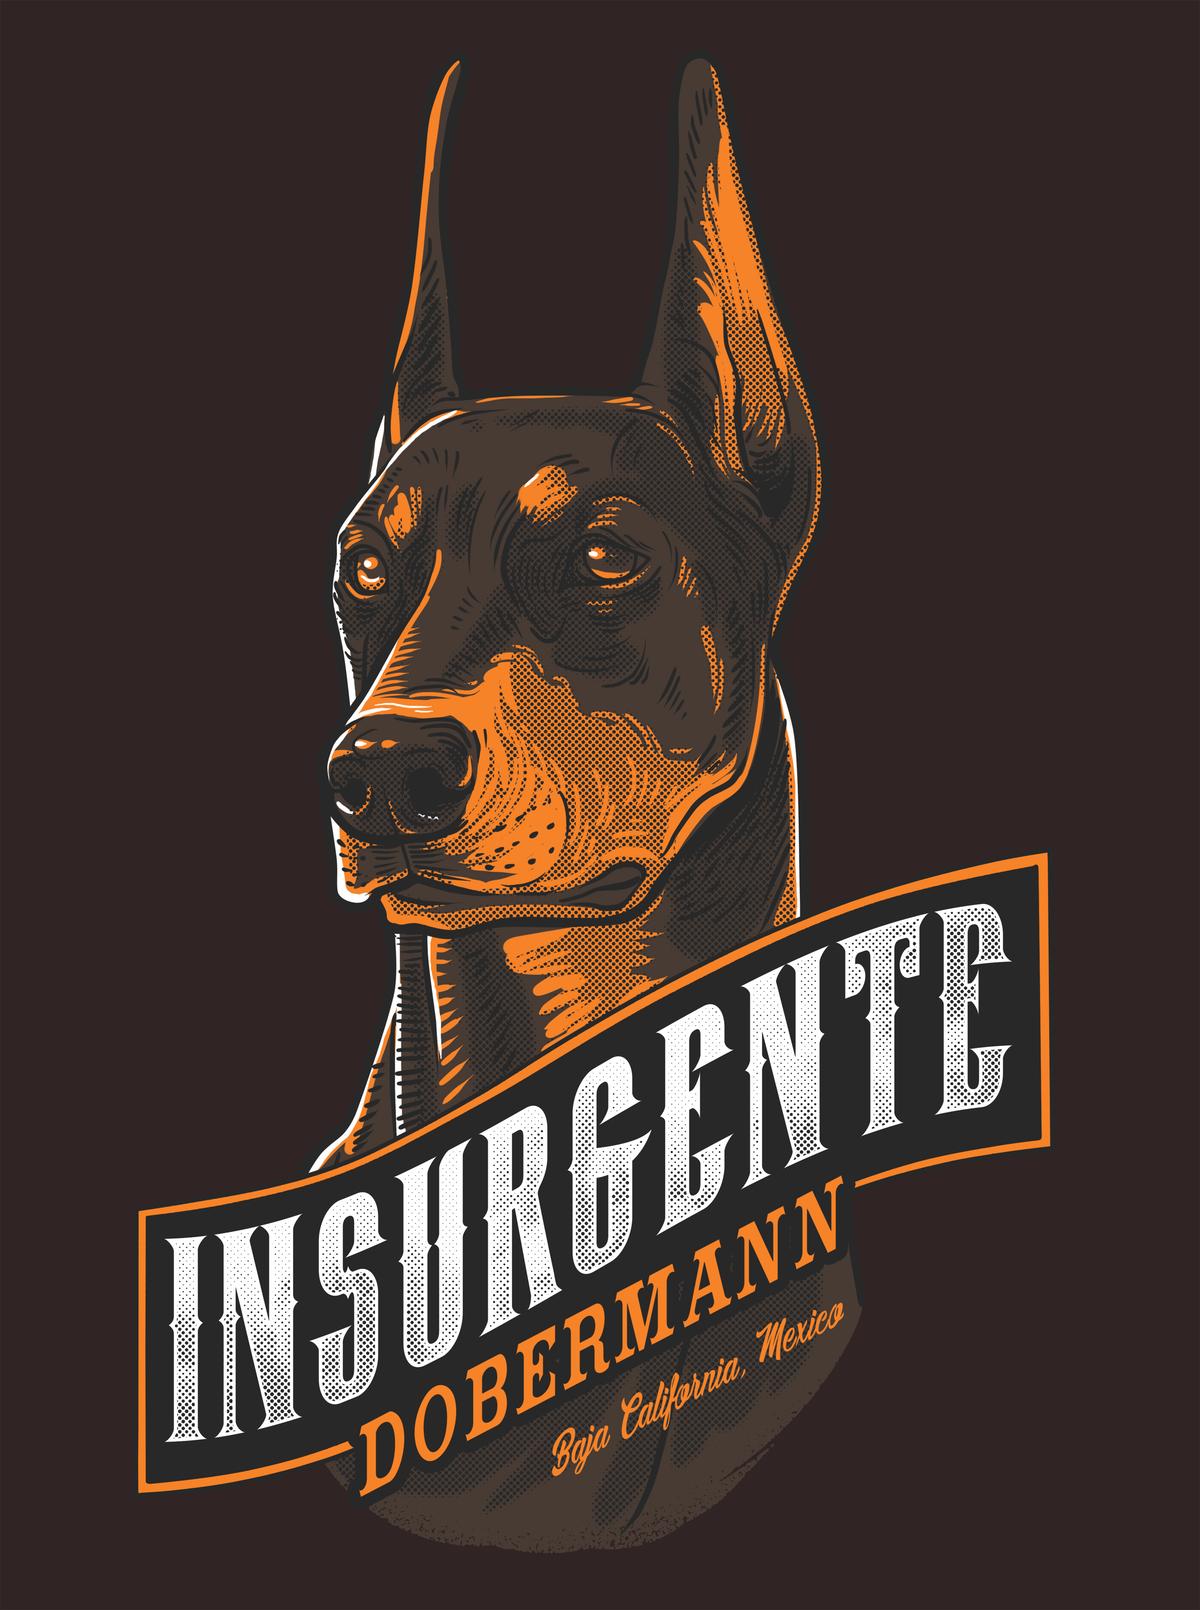 T-shirt design for a dog training club